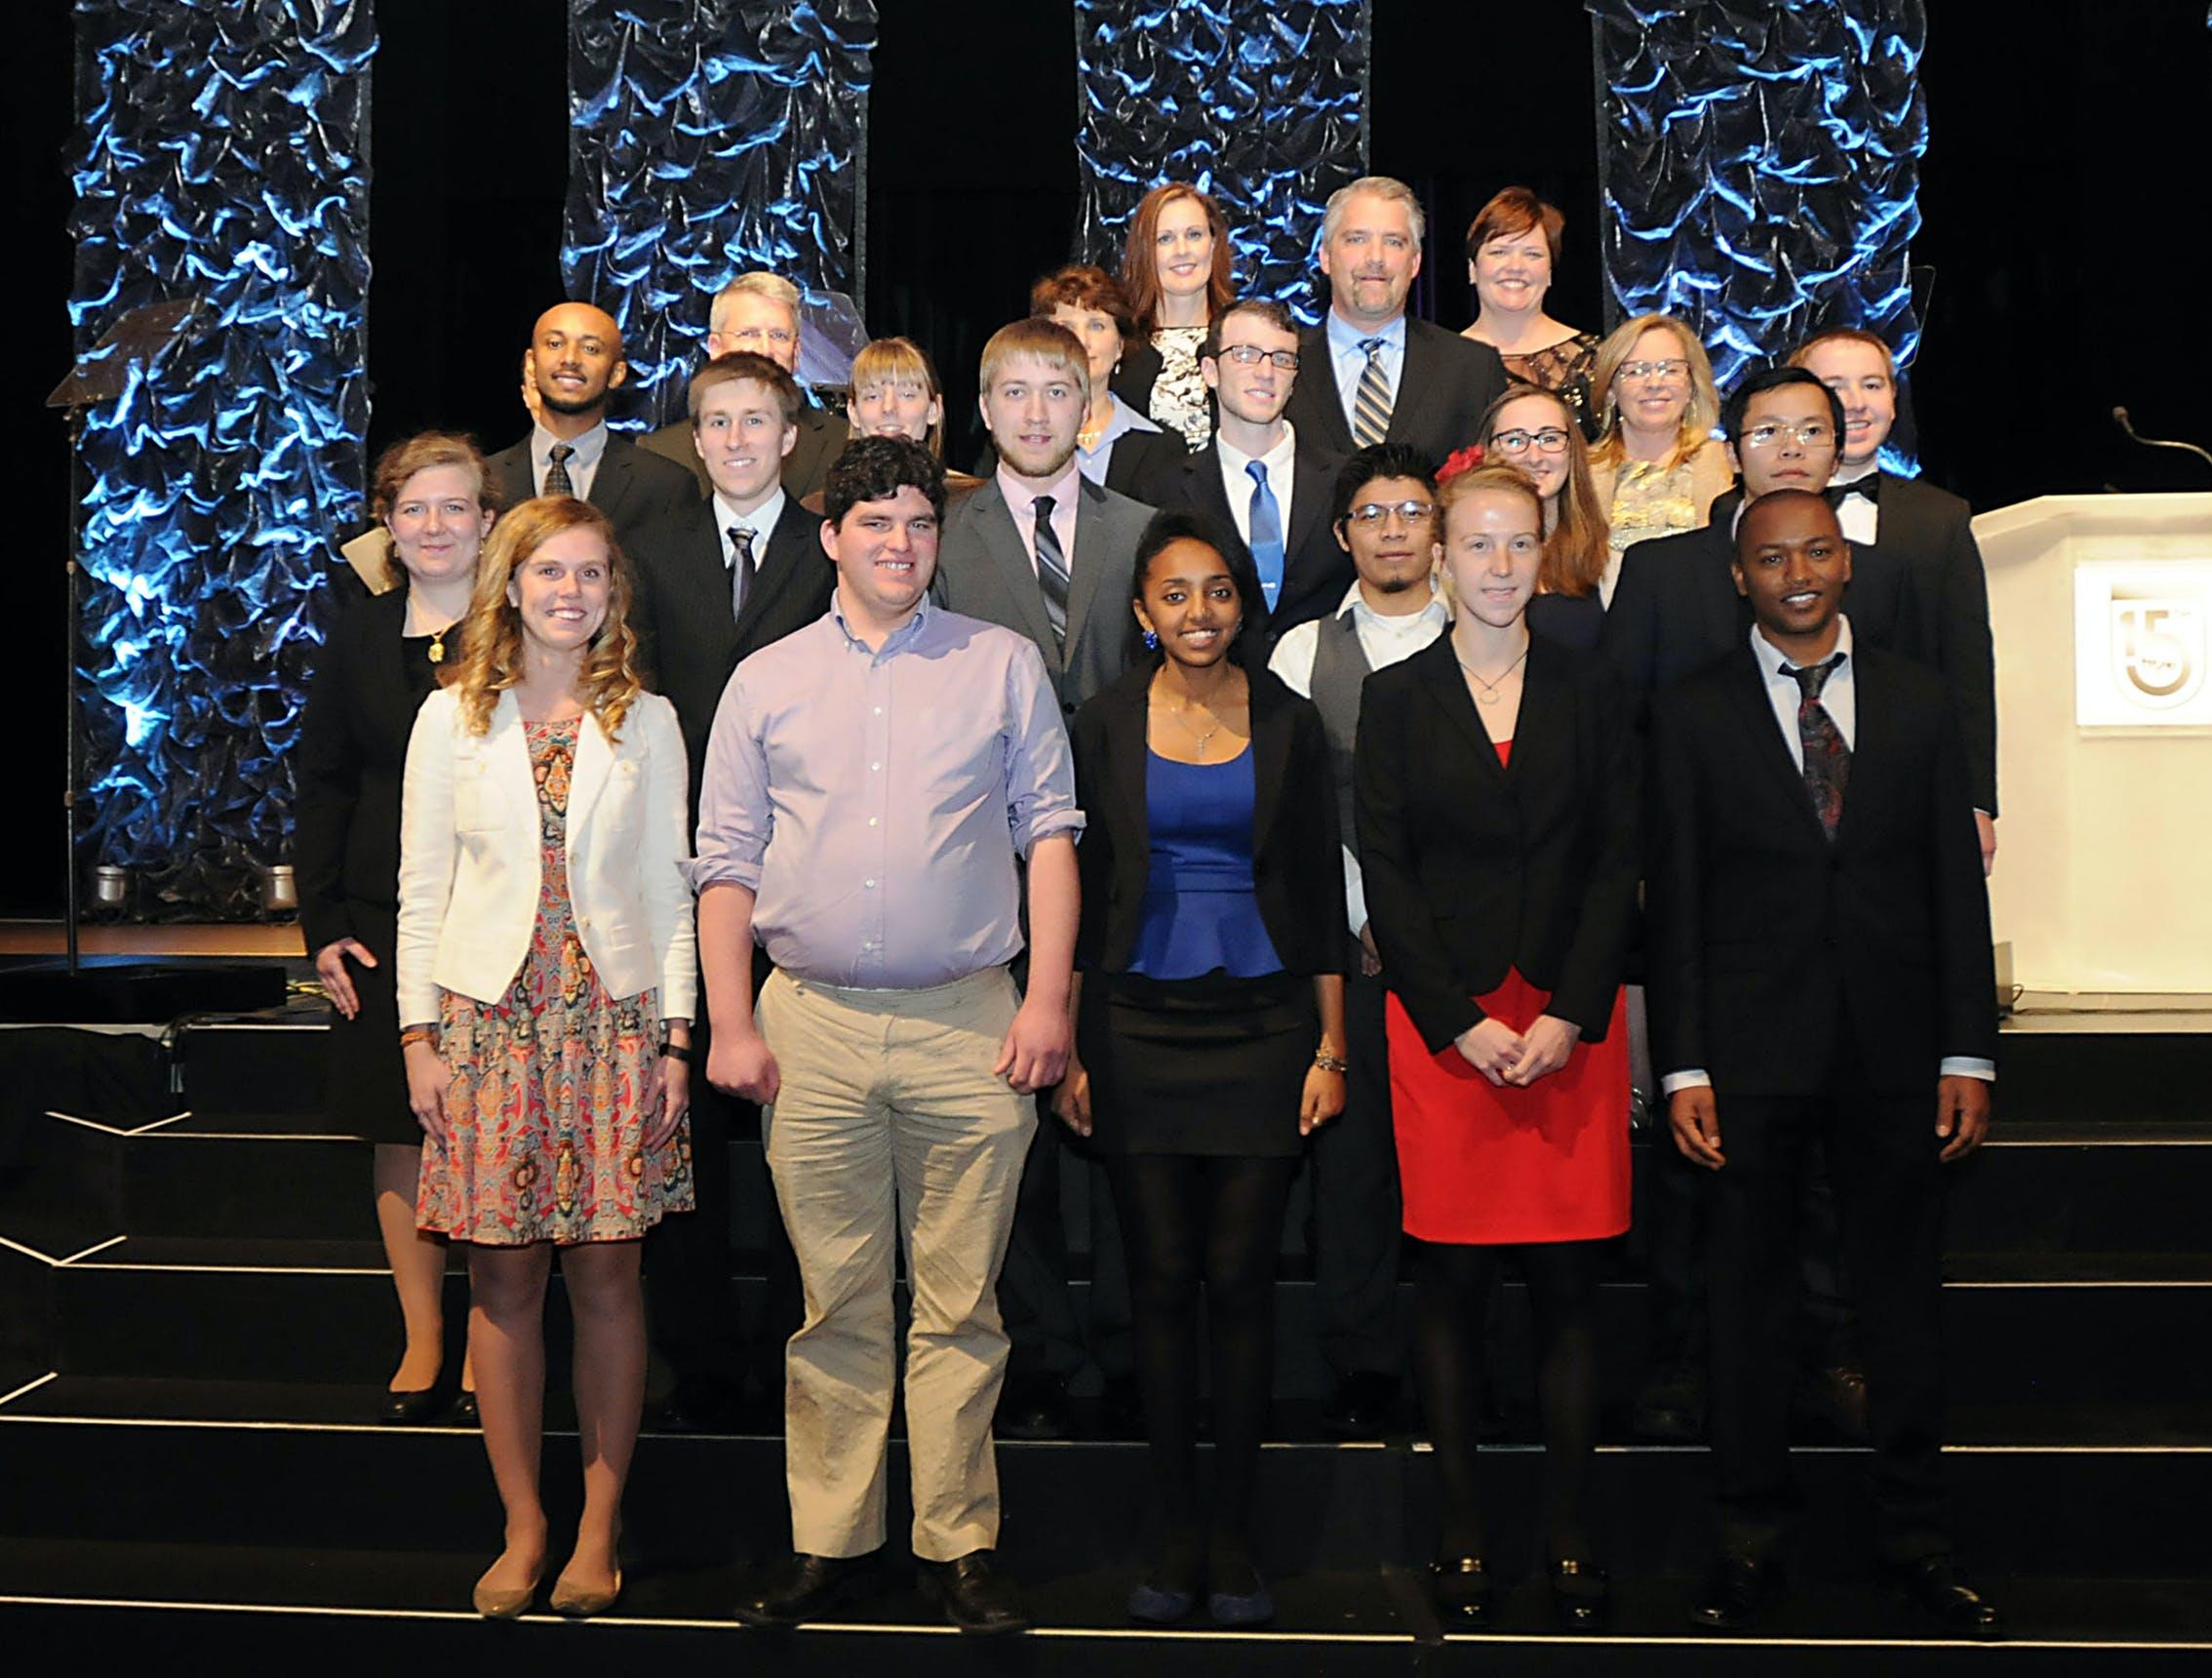 Elementary Education Major Receives STEM Scholarship Award